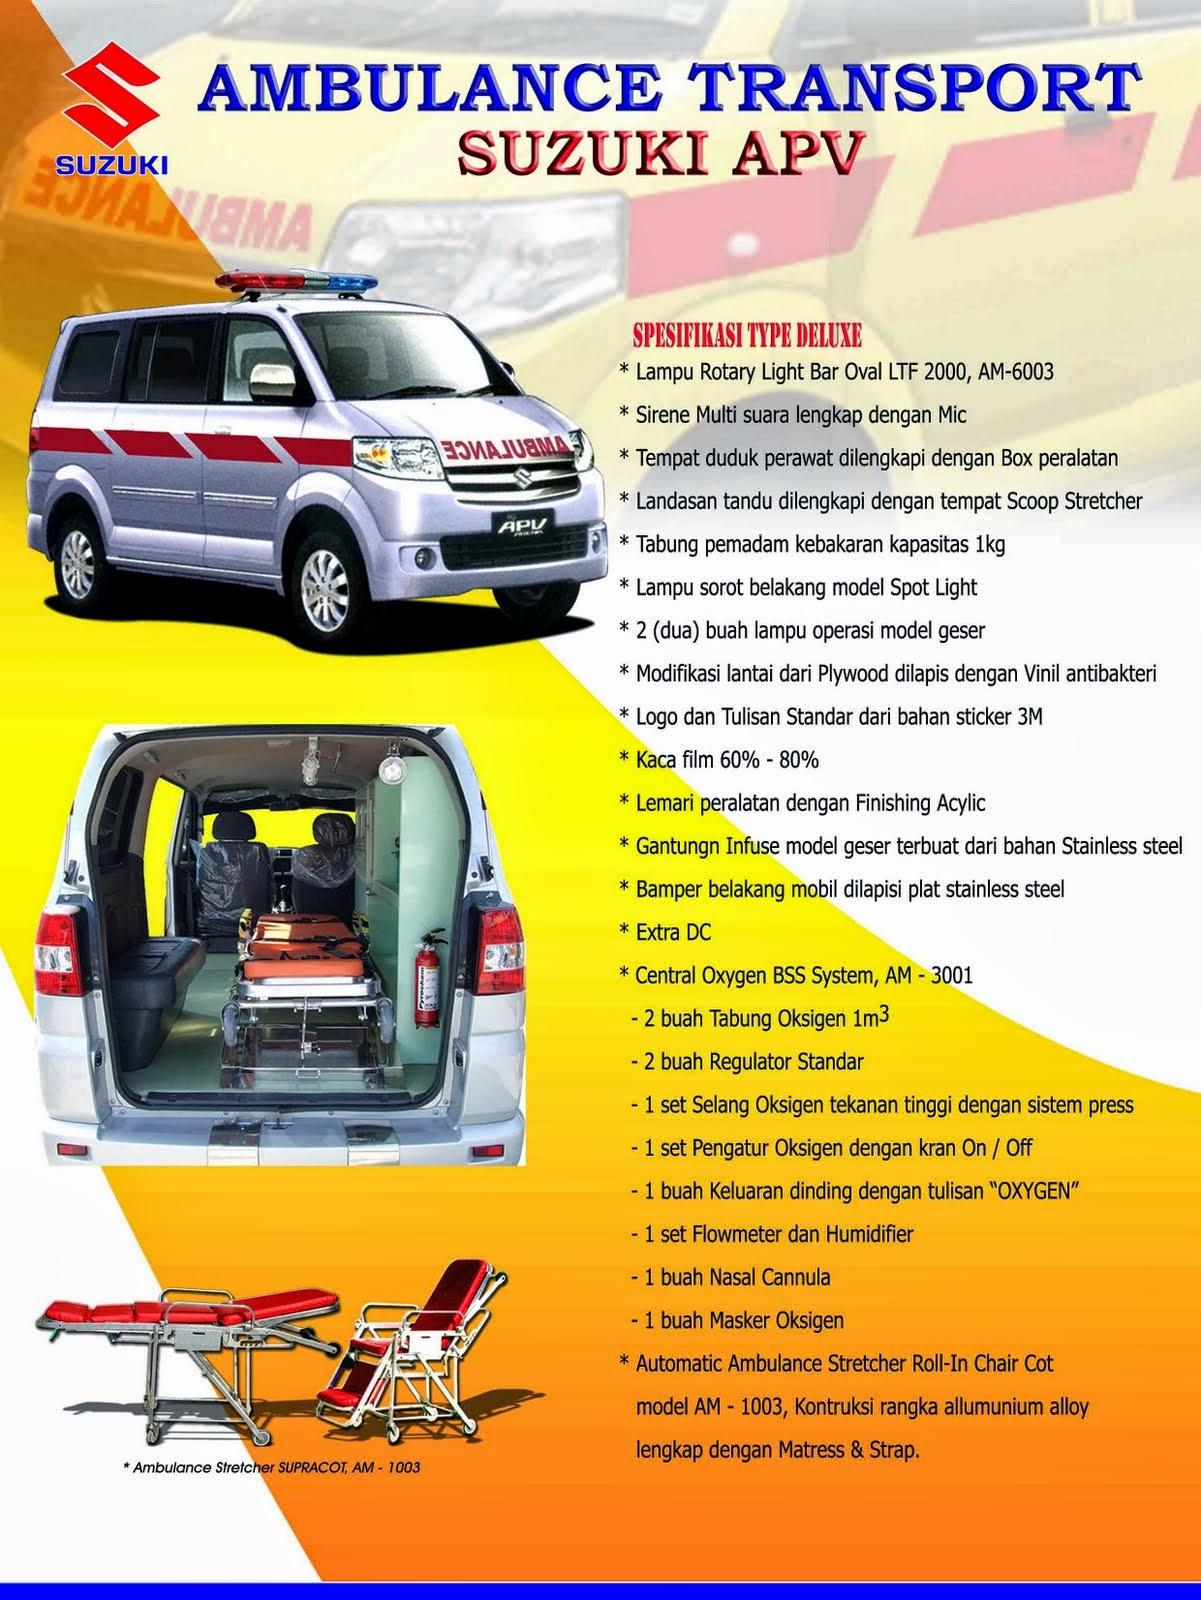 APV Ambulance Spesifikasi Deluxe 2014